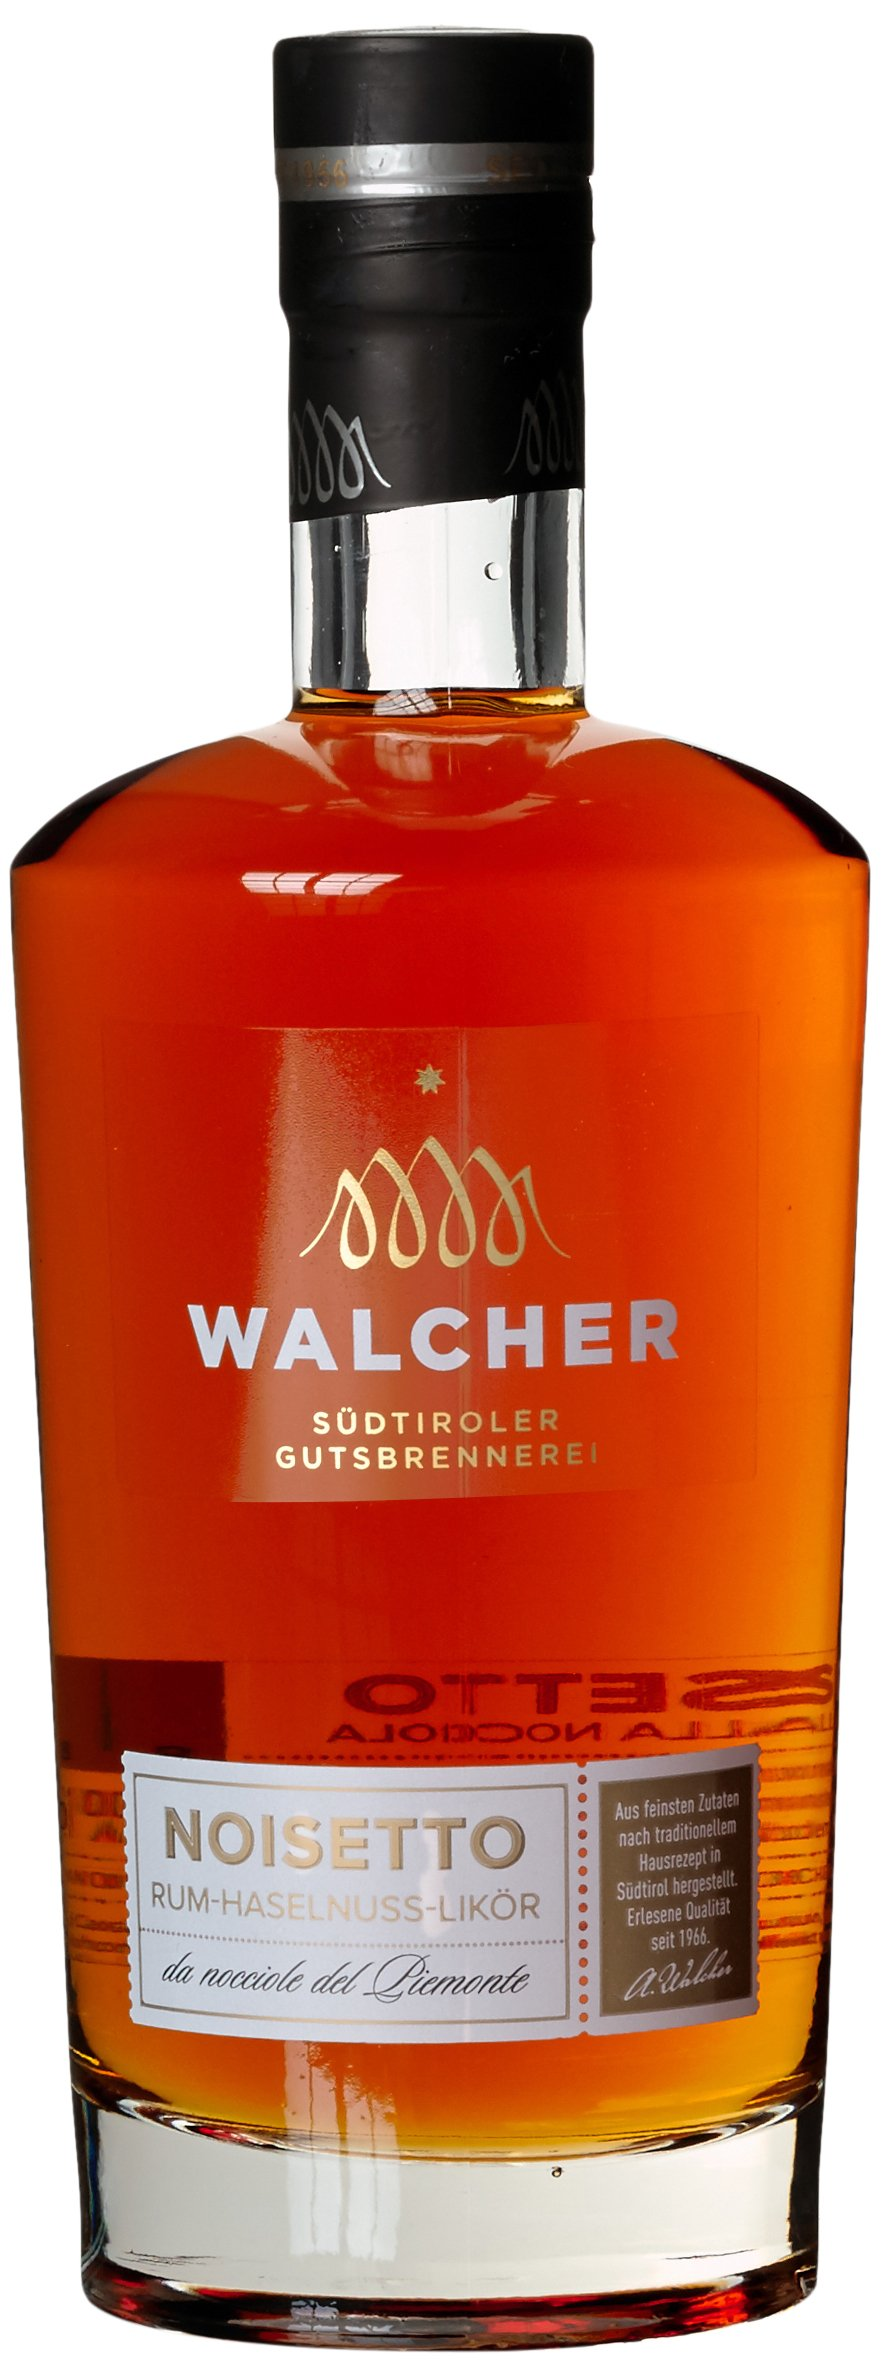 Walcher-Noisetto-Likr-1-x-07-l